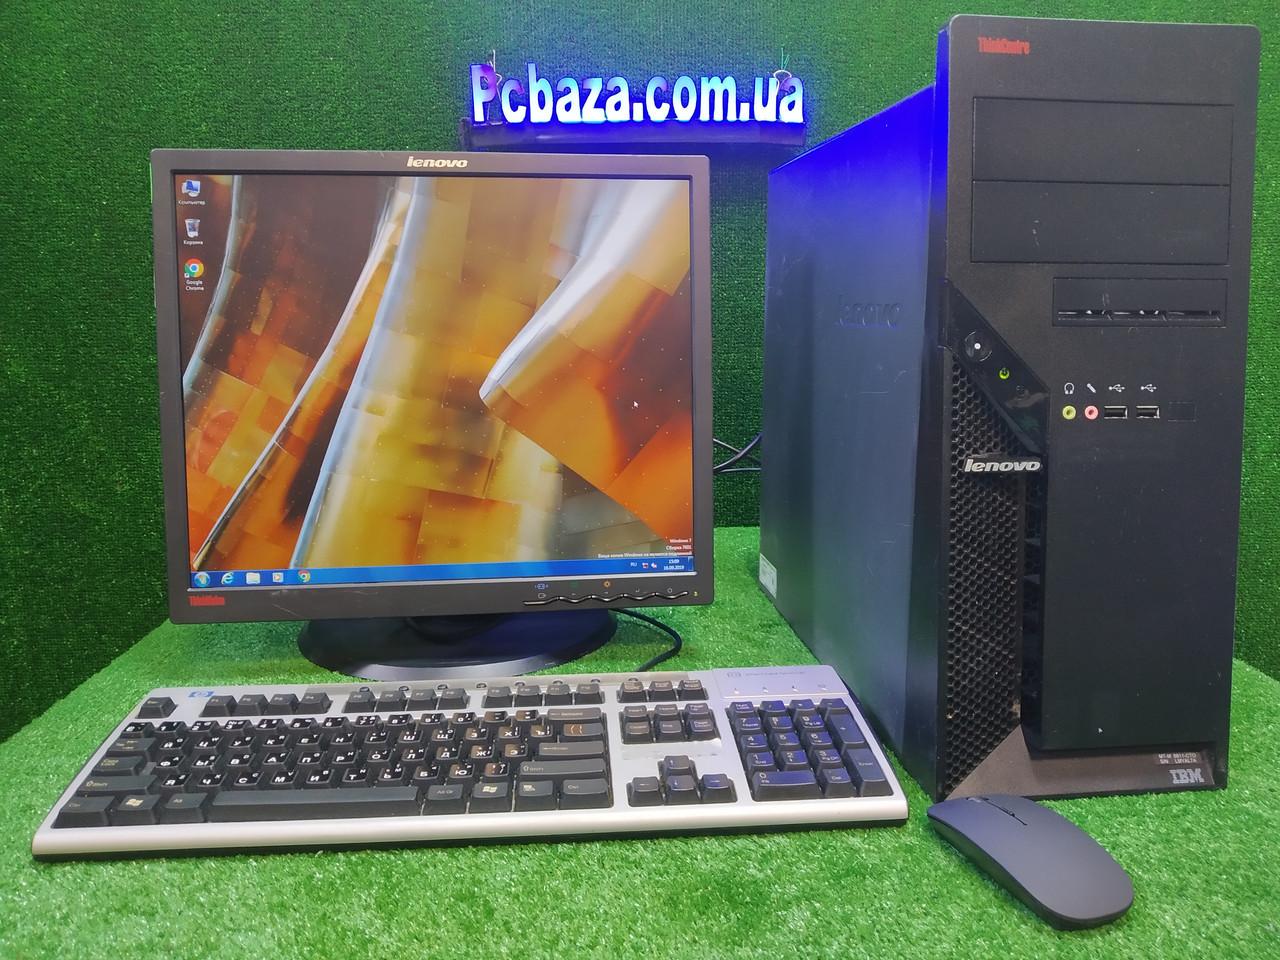 "Комплект Lenovo M55, 2 ядра, 4 ГБ ОЗУ, 160 Гб HDD + монитор 19"" Lenovo , Полностью настроен!"